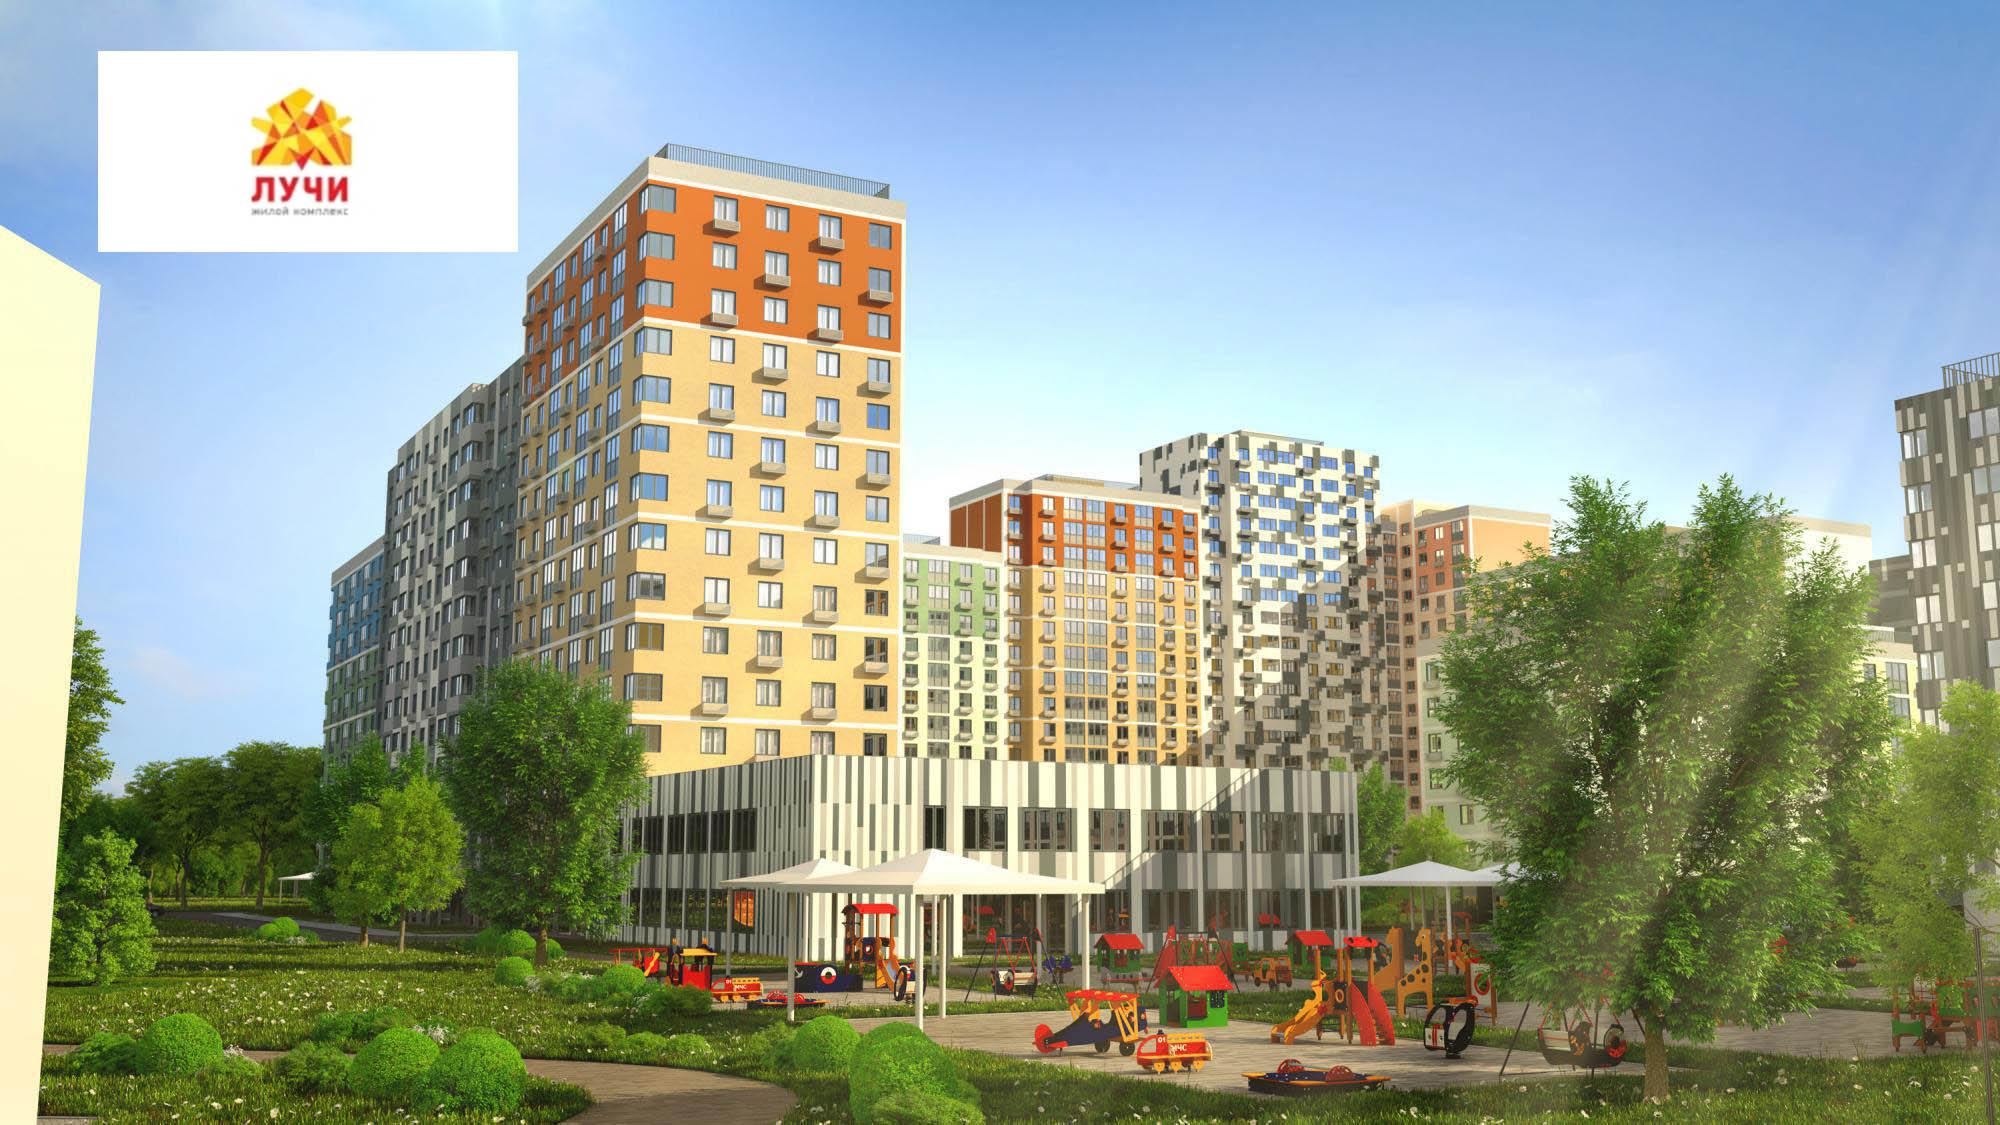 Новостройки на западе Москвы от застройщика. Жилой комплекс «Лучи» в Солнцево